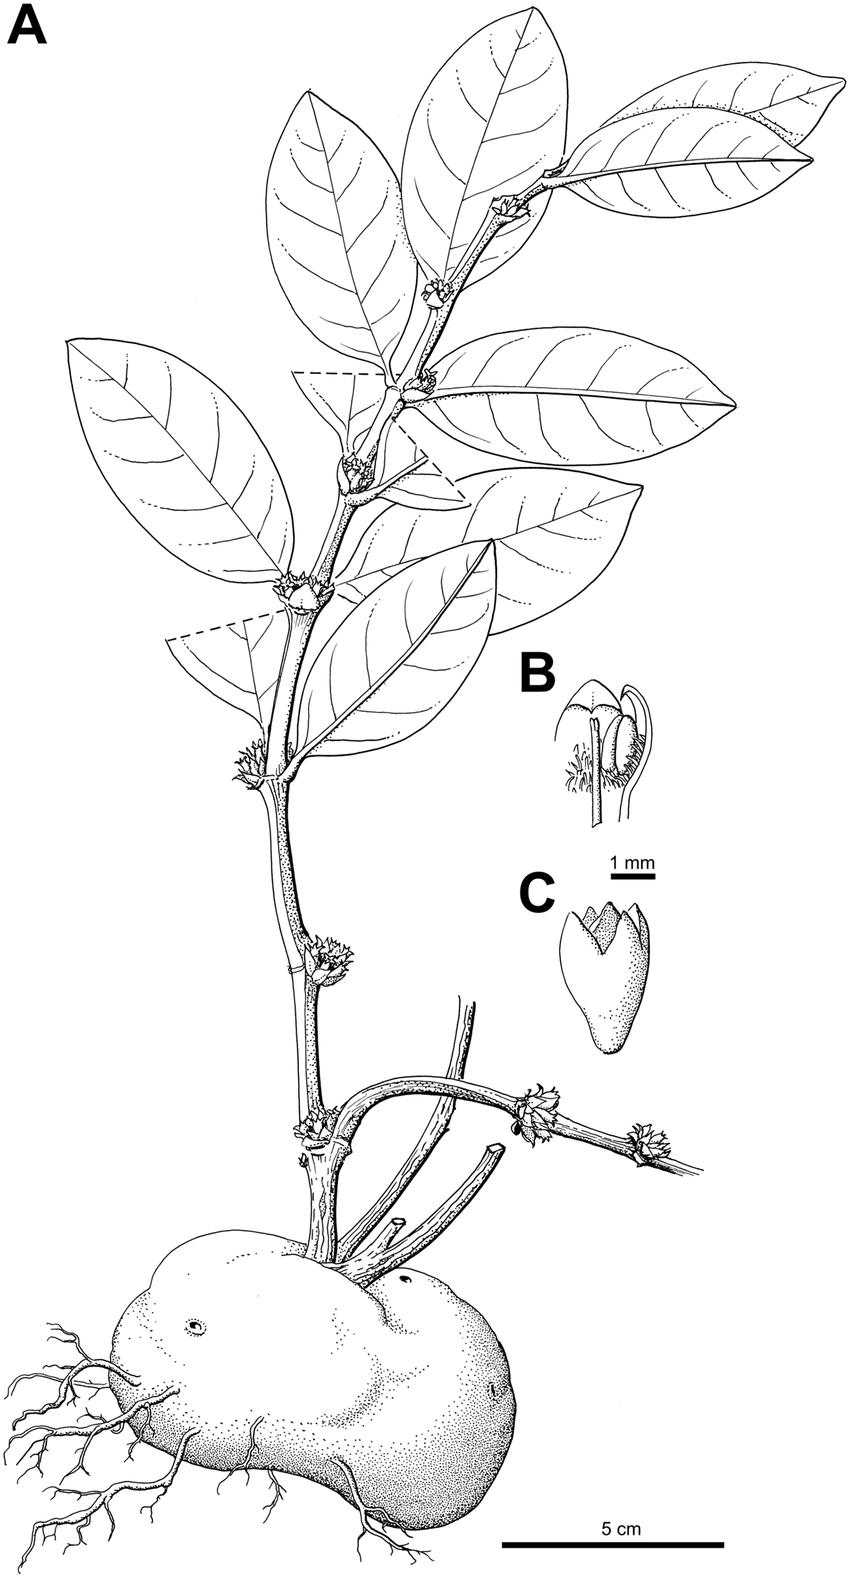 hight resolution of squamellaria vanuatuensis jebb c r huxley spec nov a habit showing the domatium b inner view of flower throat c hypanthium and calyx